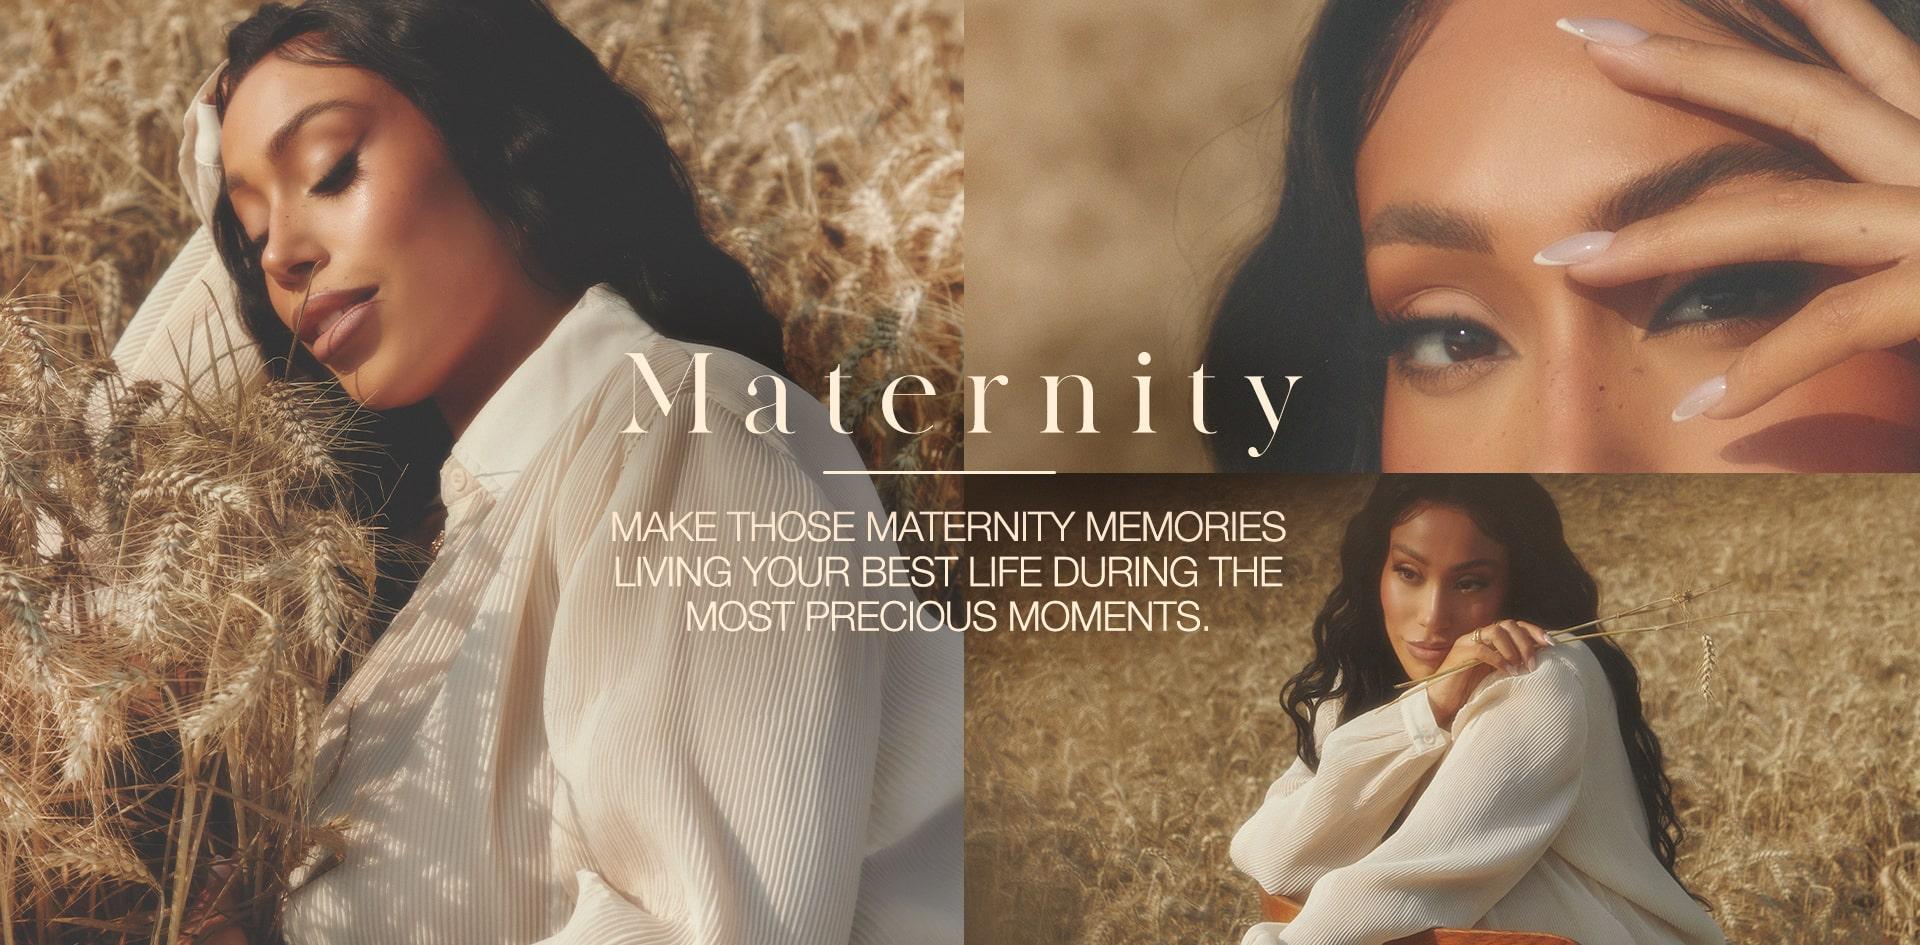 Maternity Lookbook Image Desktop 7